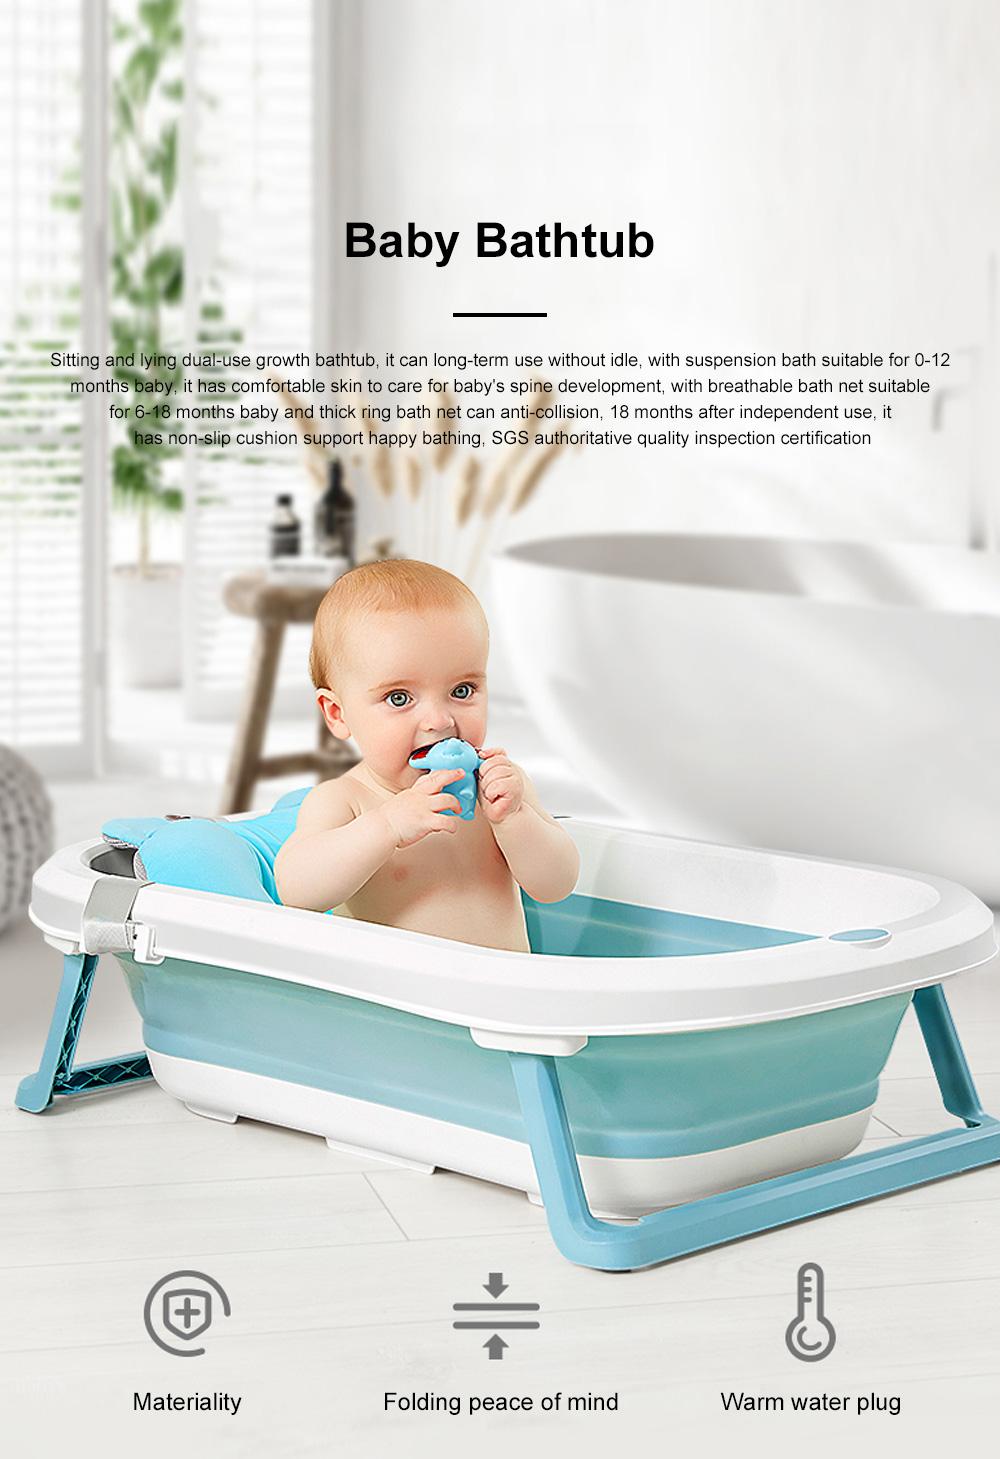 Portable Folding Baby Bath Tub Anti-Slip Bottom Non-Toxic Material Children Bathtub Bucket For Baby within 5 Year Old 0